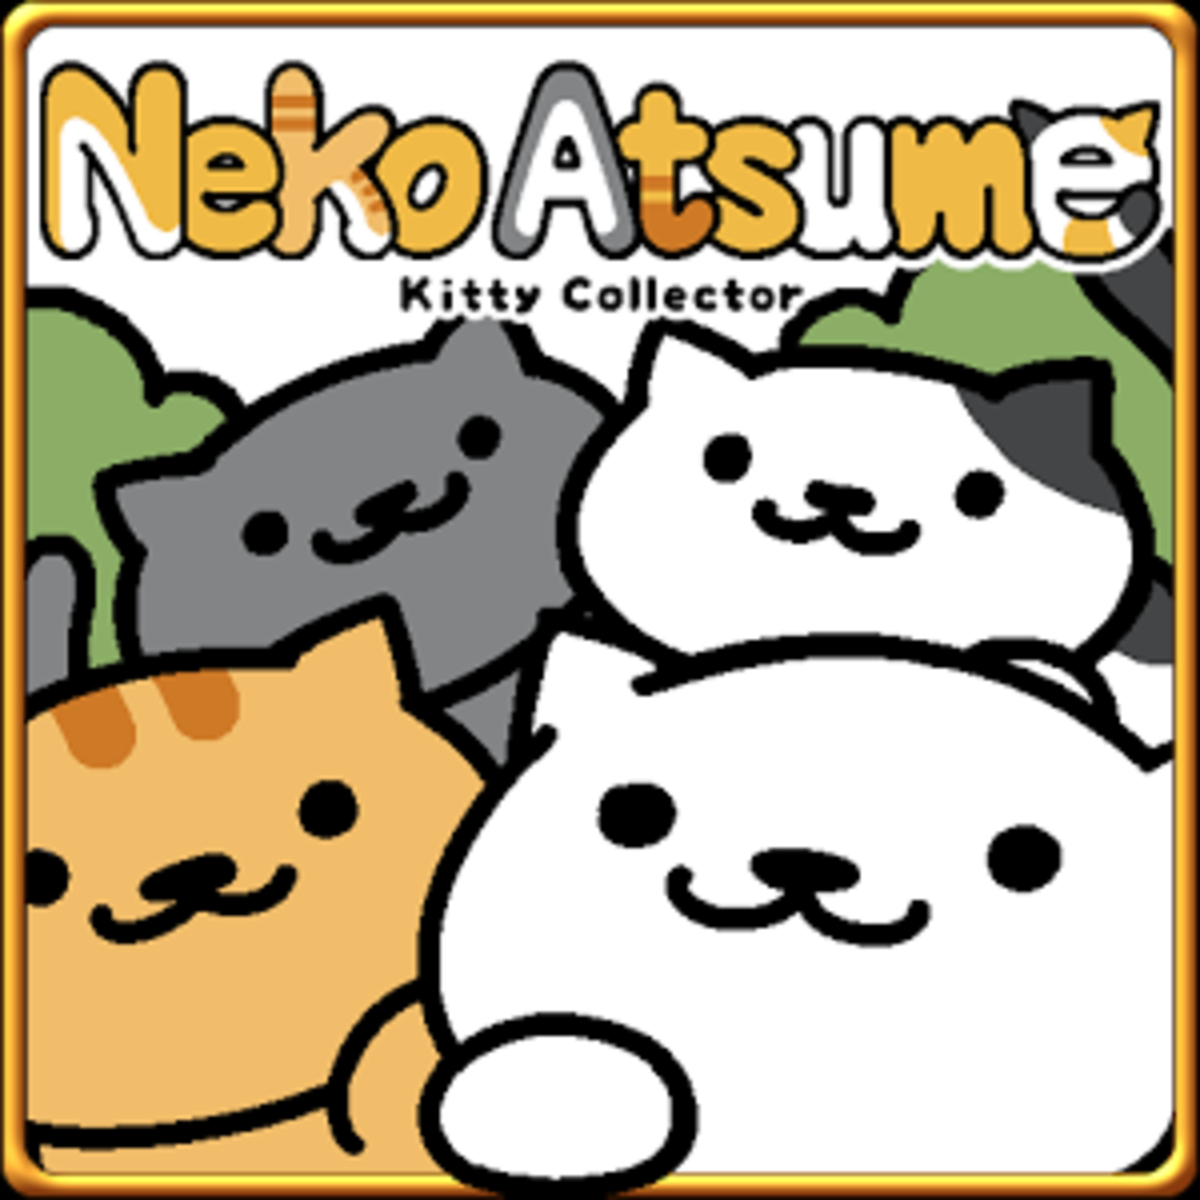 """Neko atsume logo"" by Source. Licensed under Fair use via Wikipedia - https://en.wikipedia.org/wiki/File:Neko_atsume_logo.png#/media/File:Neko_atsume_logo.png"